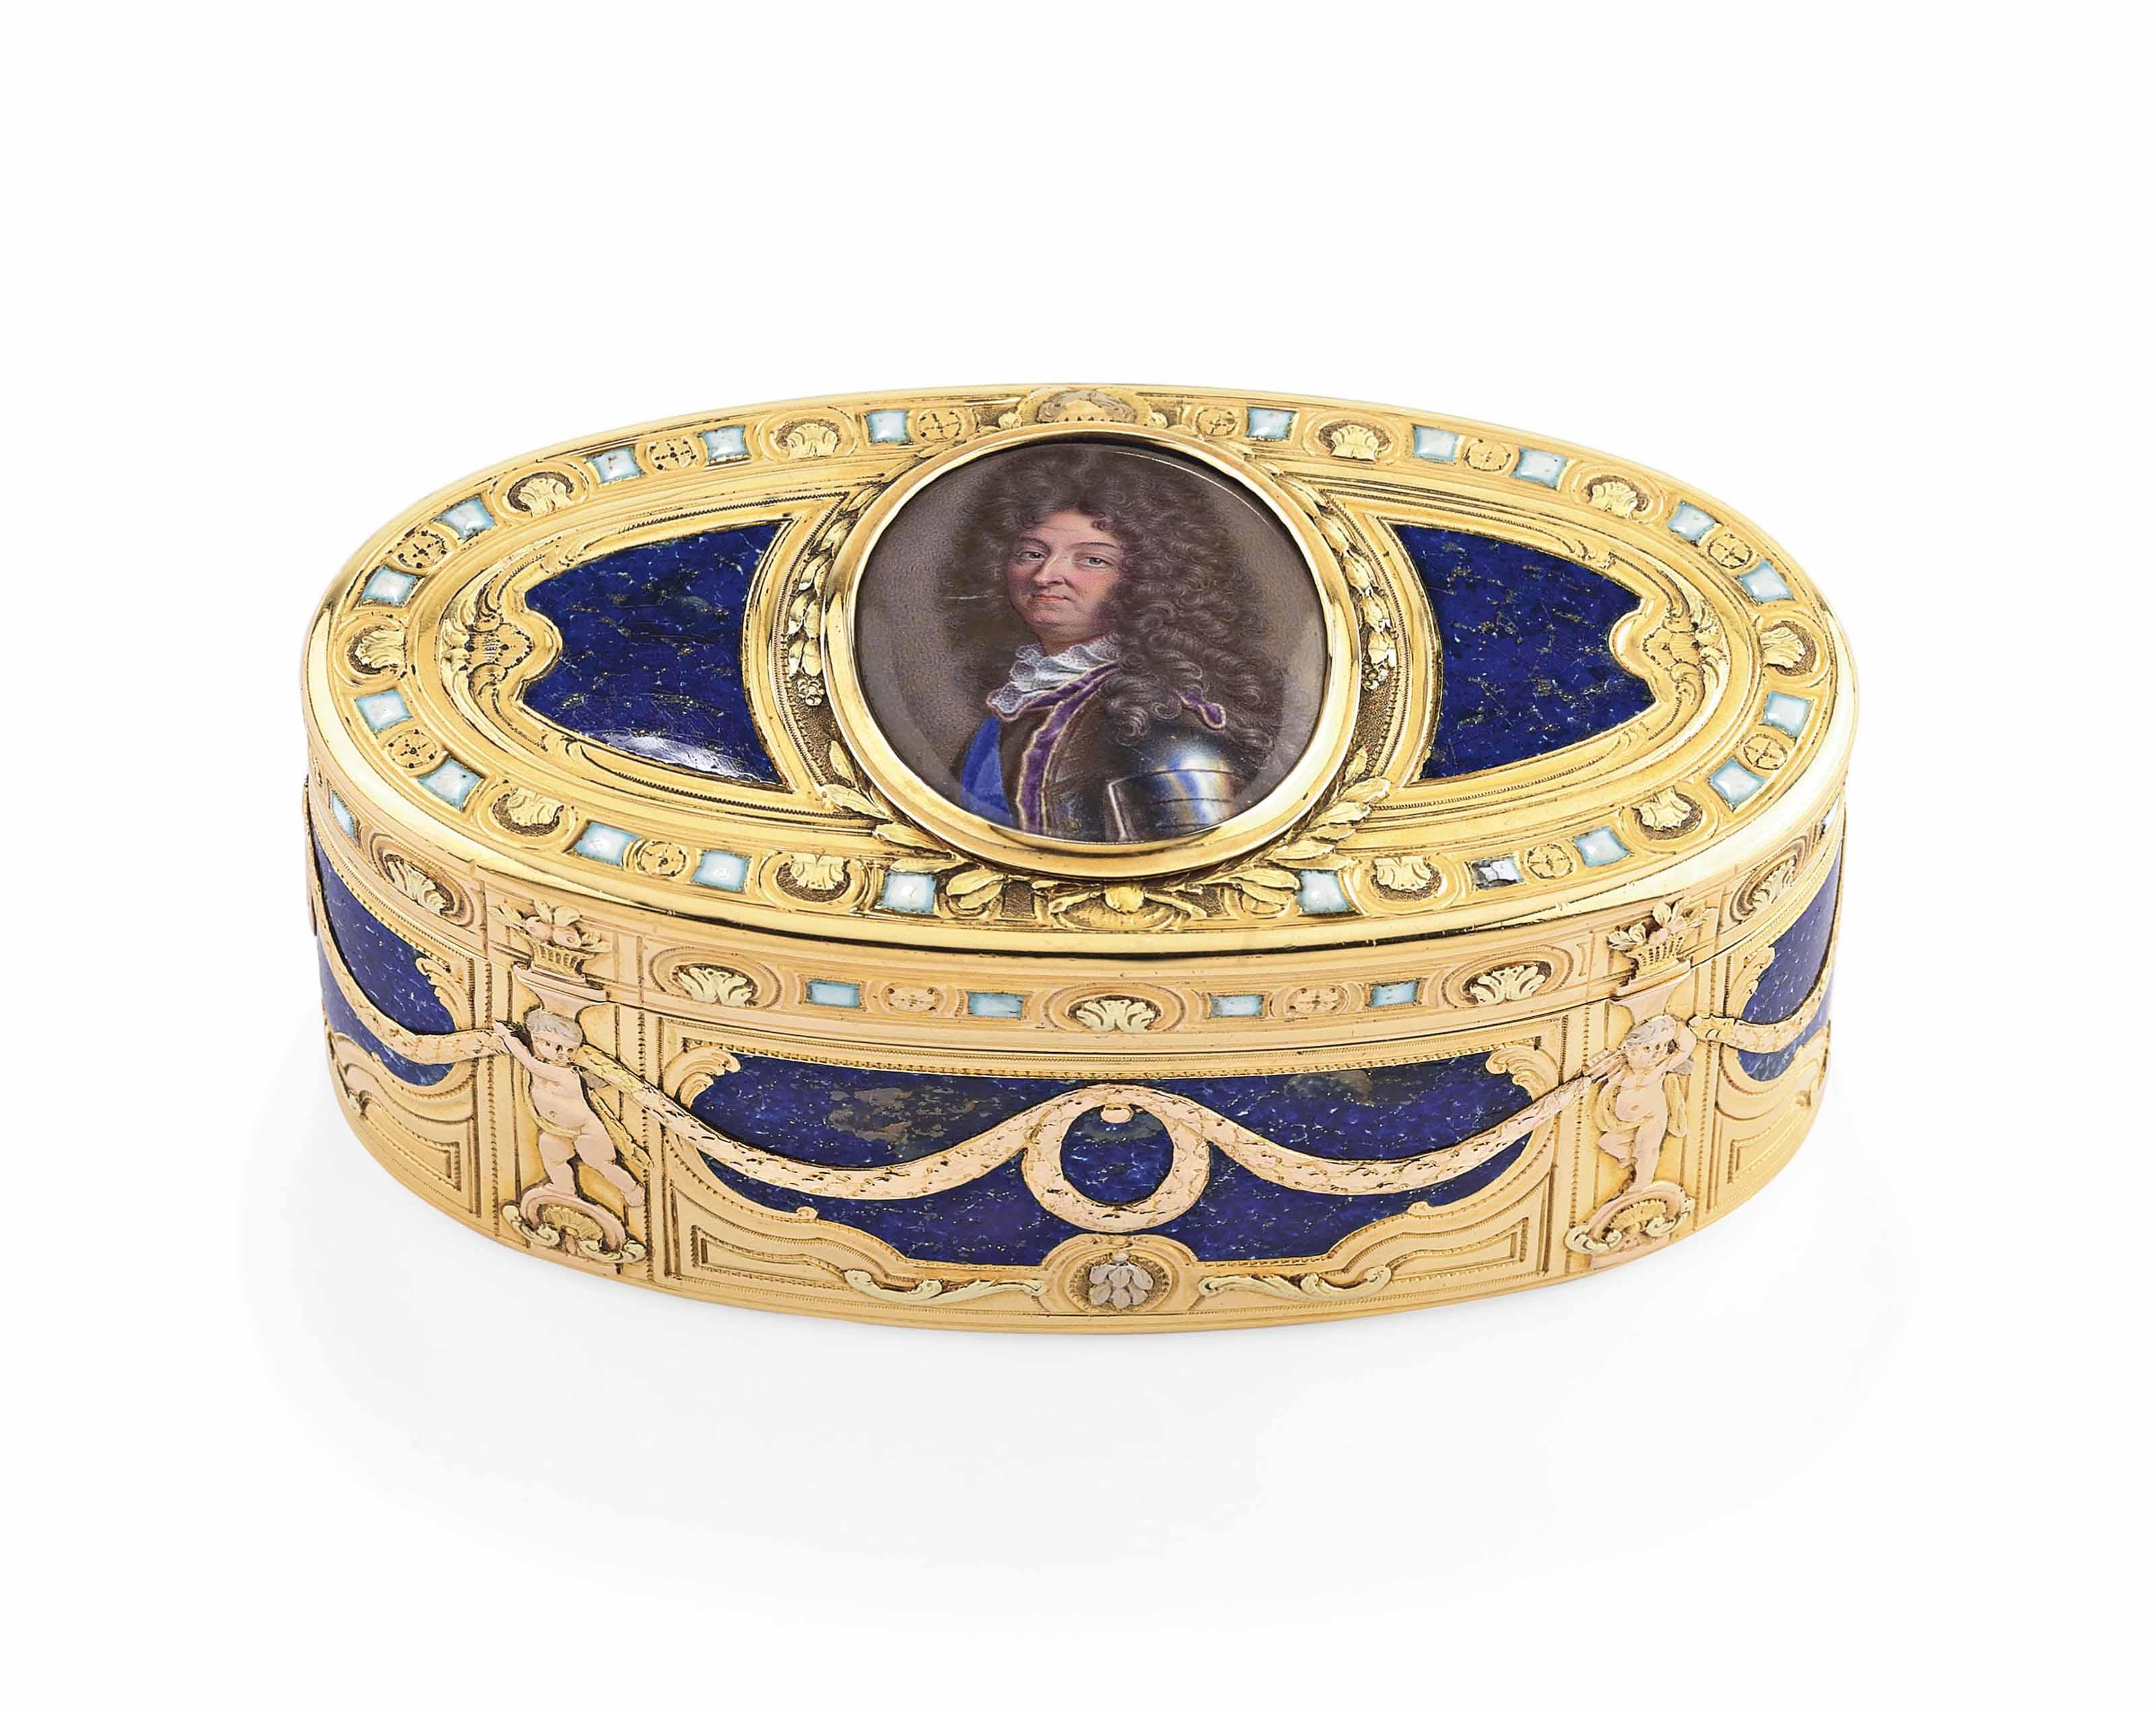 A LOUIS XV ENAMELLED VARI-COLOUR GOLD SNUFF-BOX SET WITH A MINIATURE